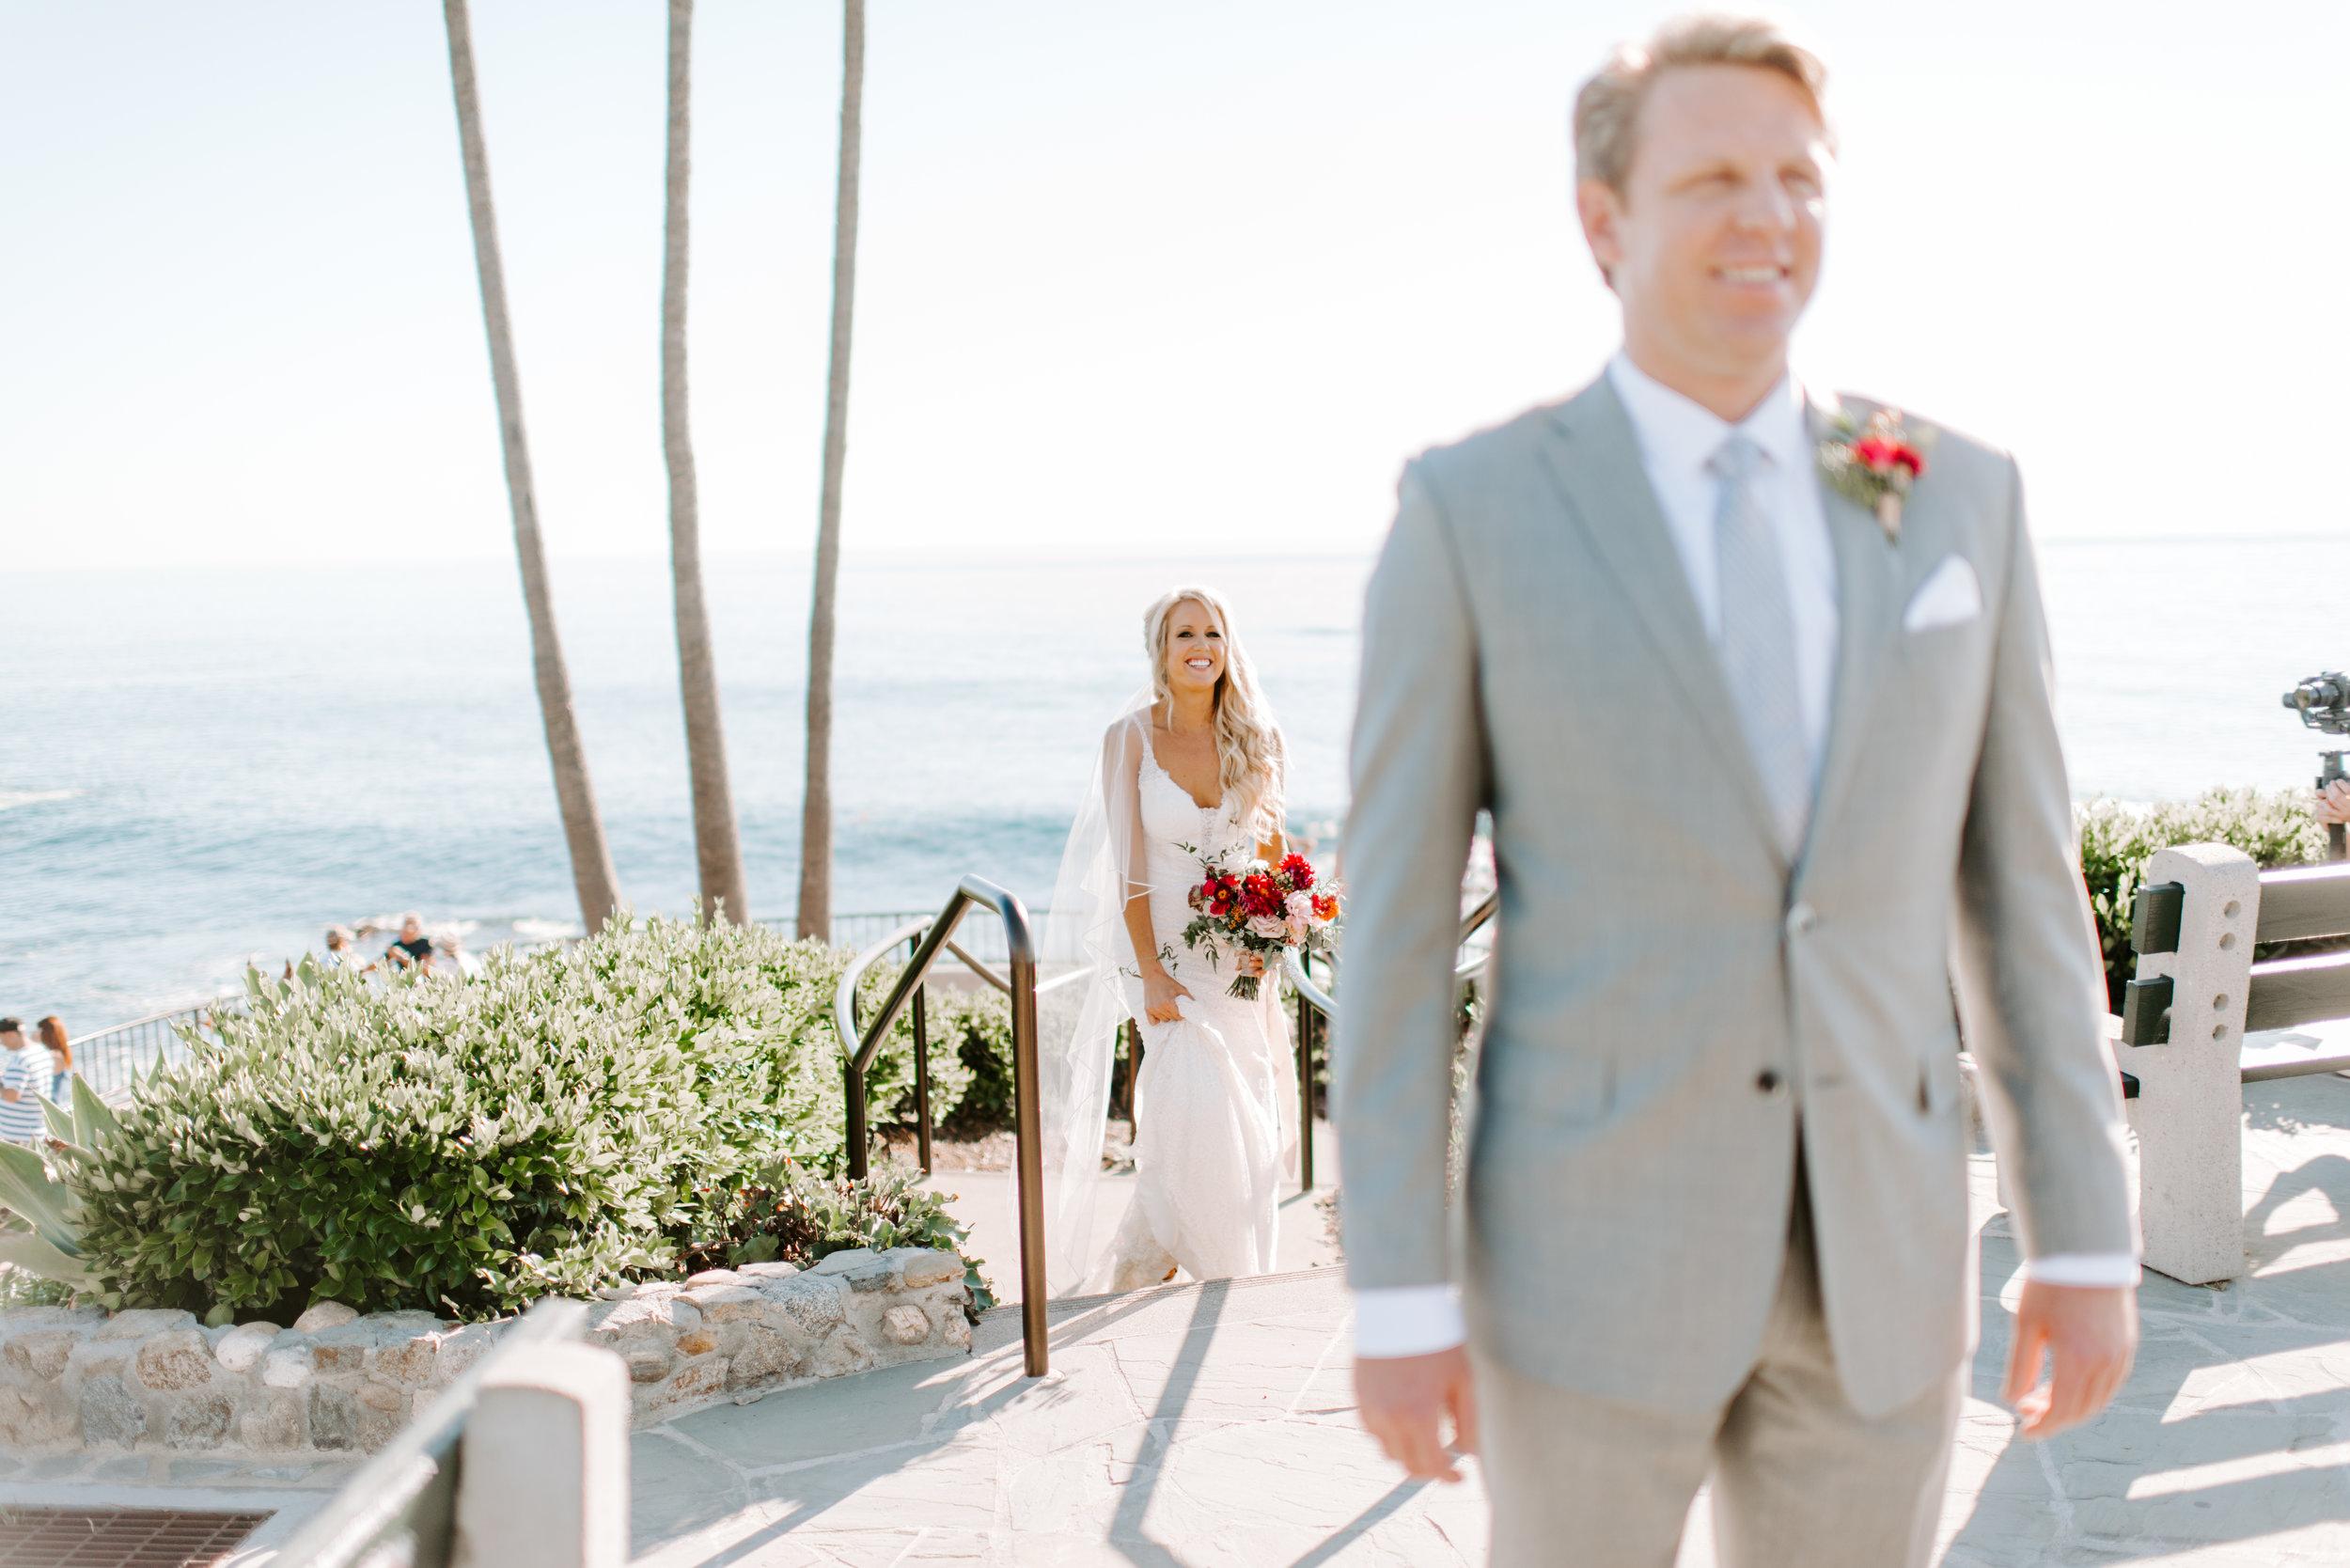 Laguna Beach first look before the wedding